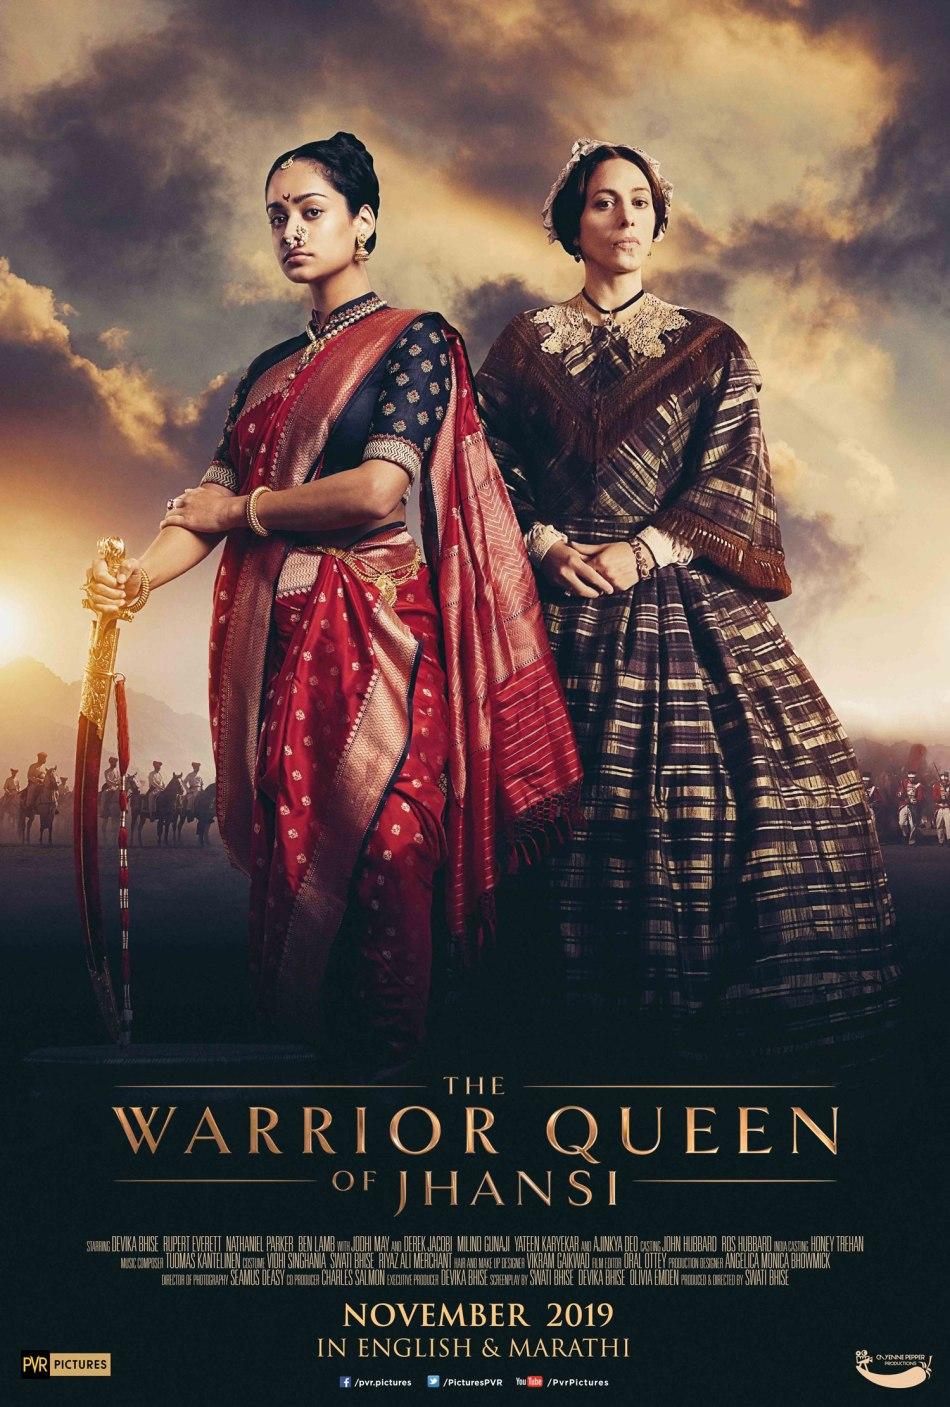 Swati-Bhise-film-poster